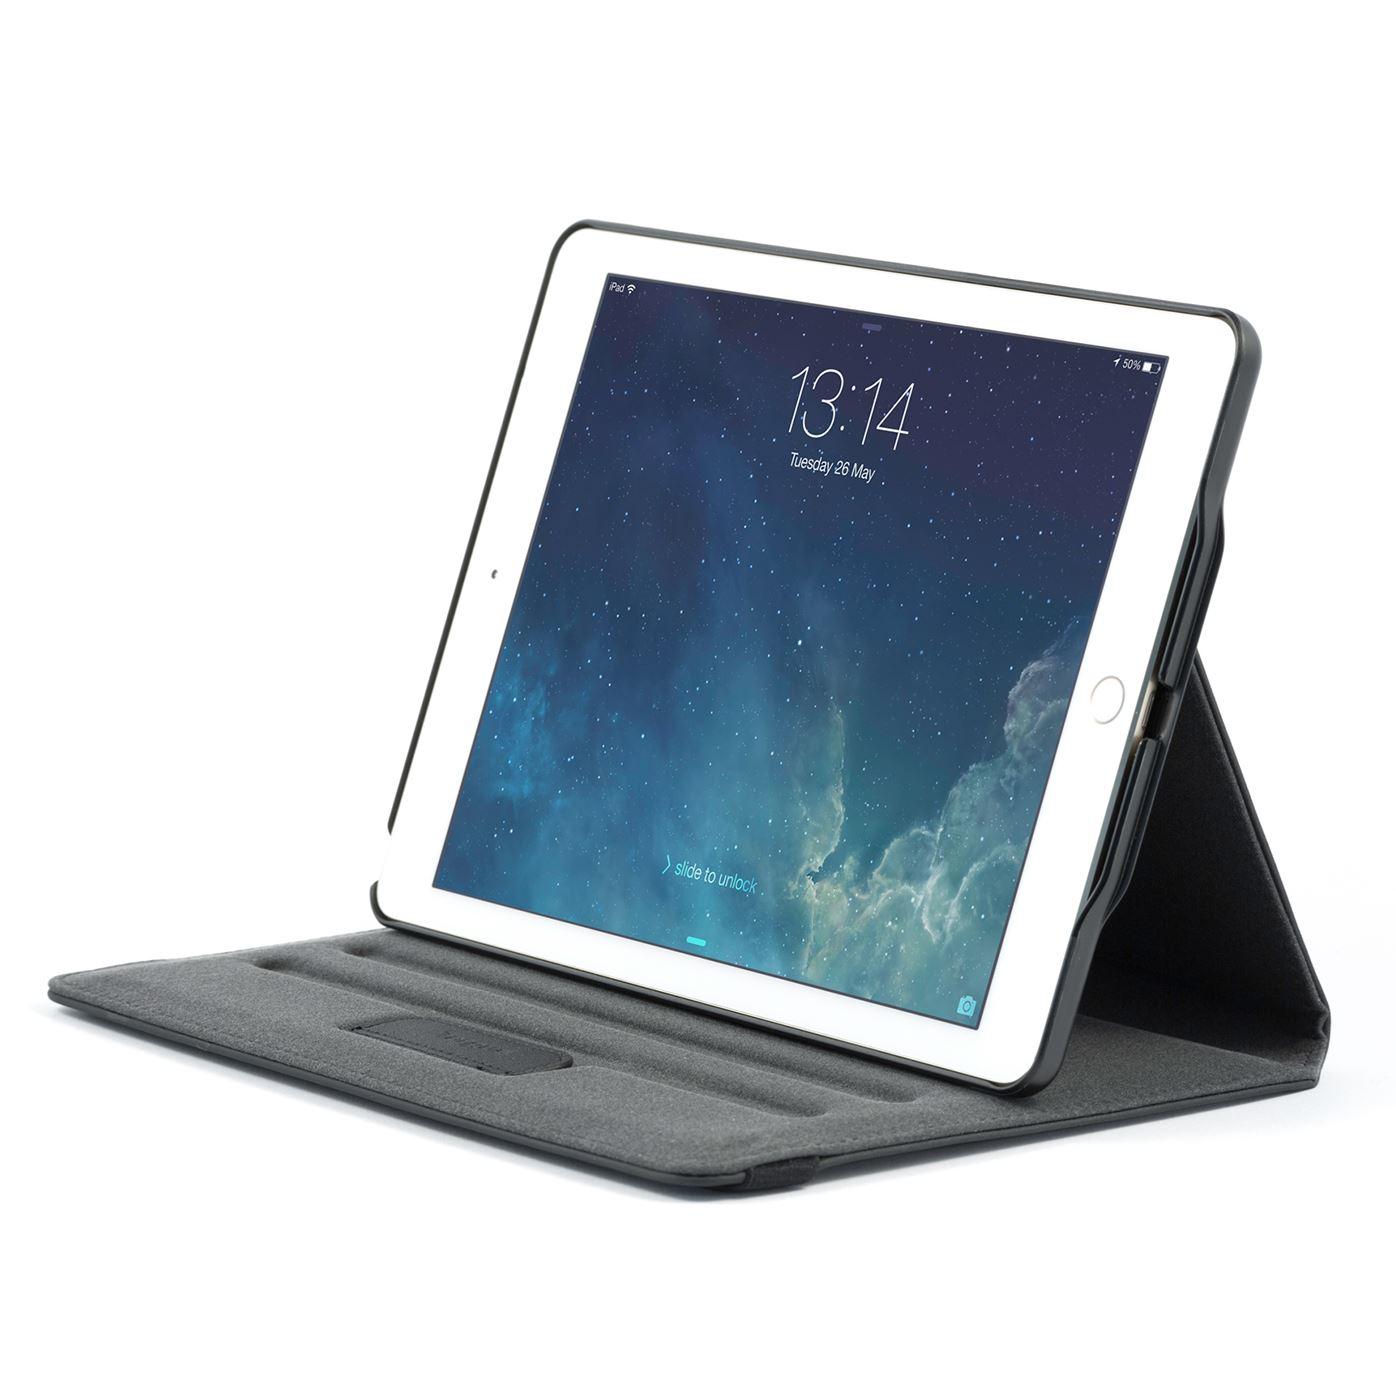 versavu tui rotatif 360 degr s pour apple ipad air 2 noir. Black Bedroom Furniture Sets. Home Design Ideas